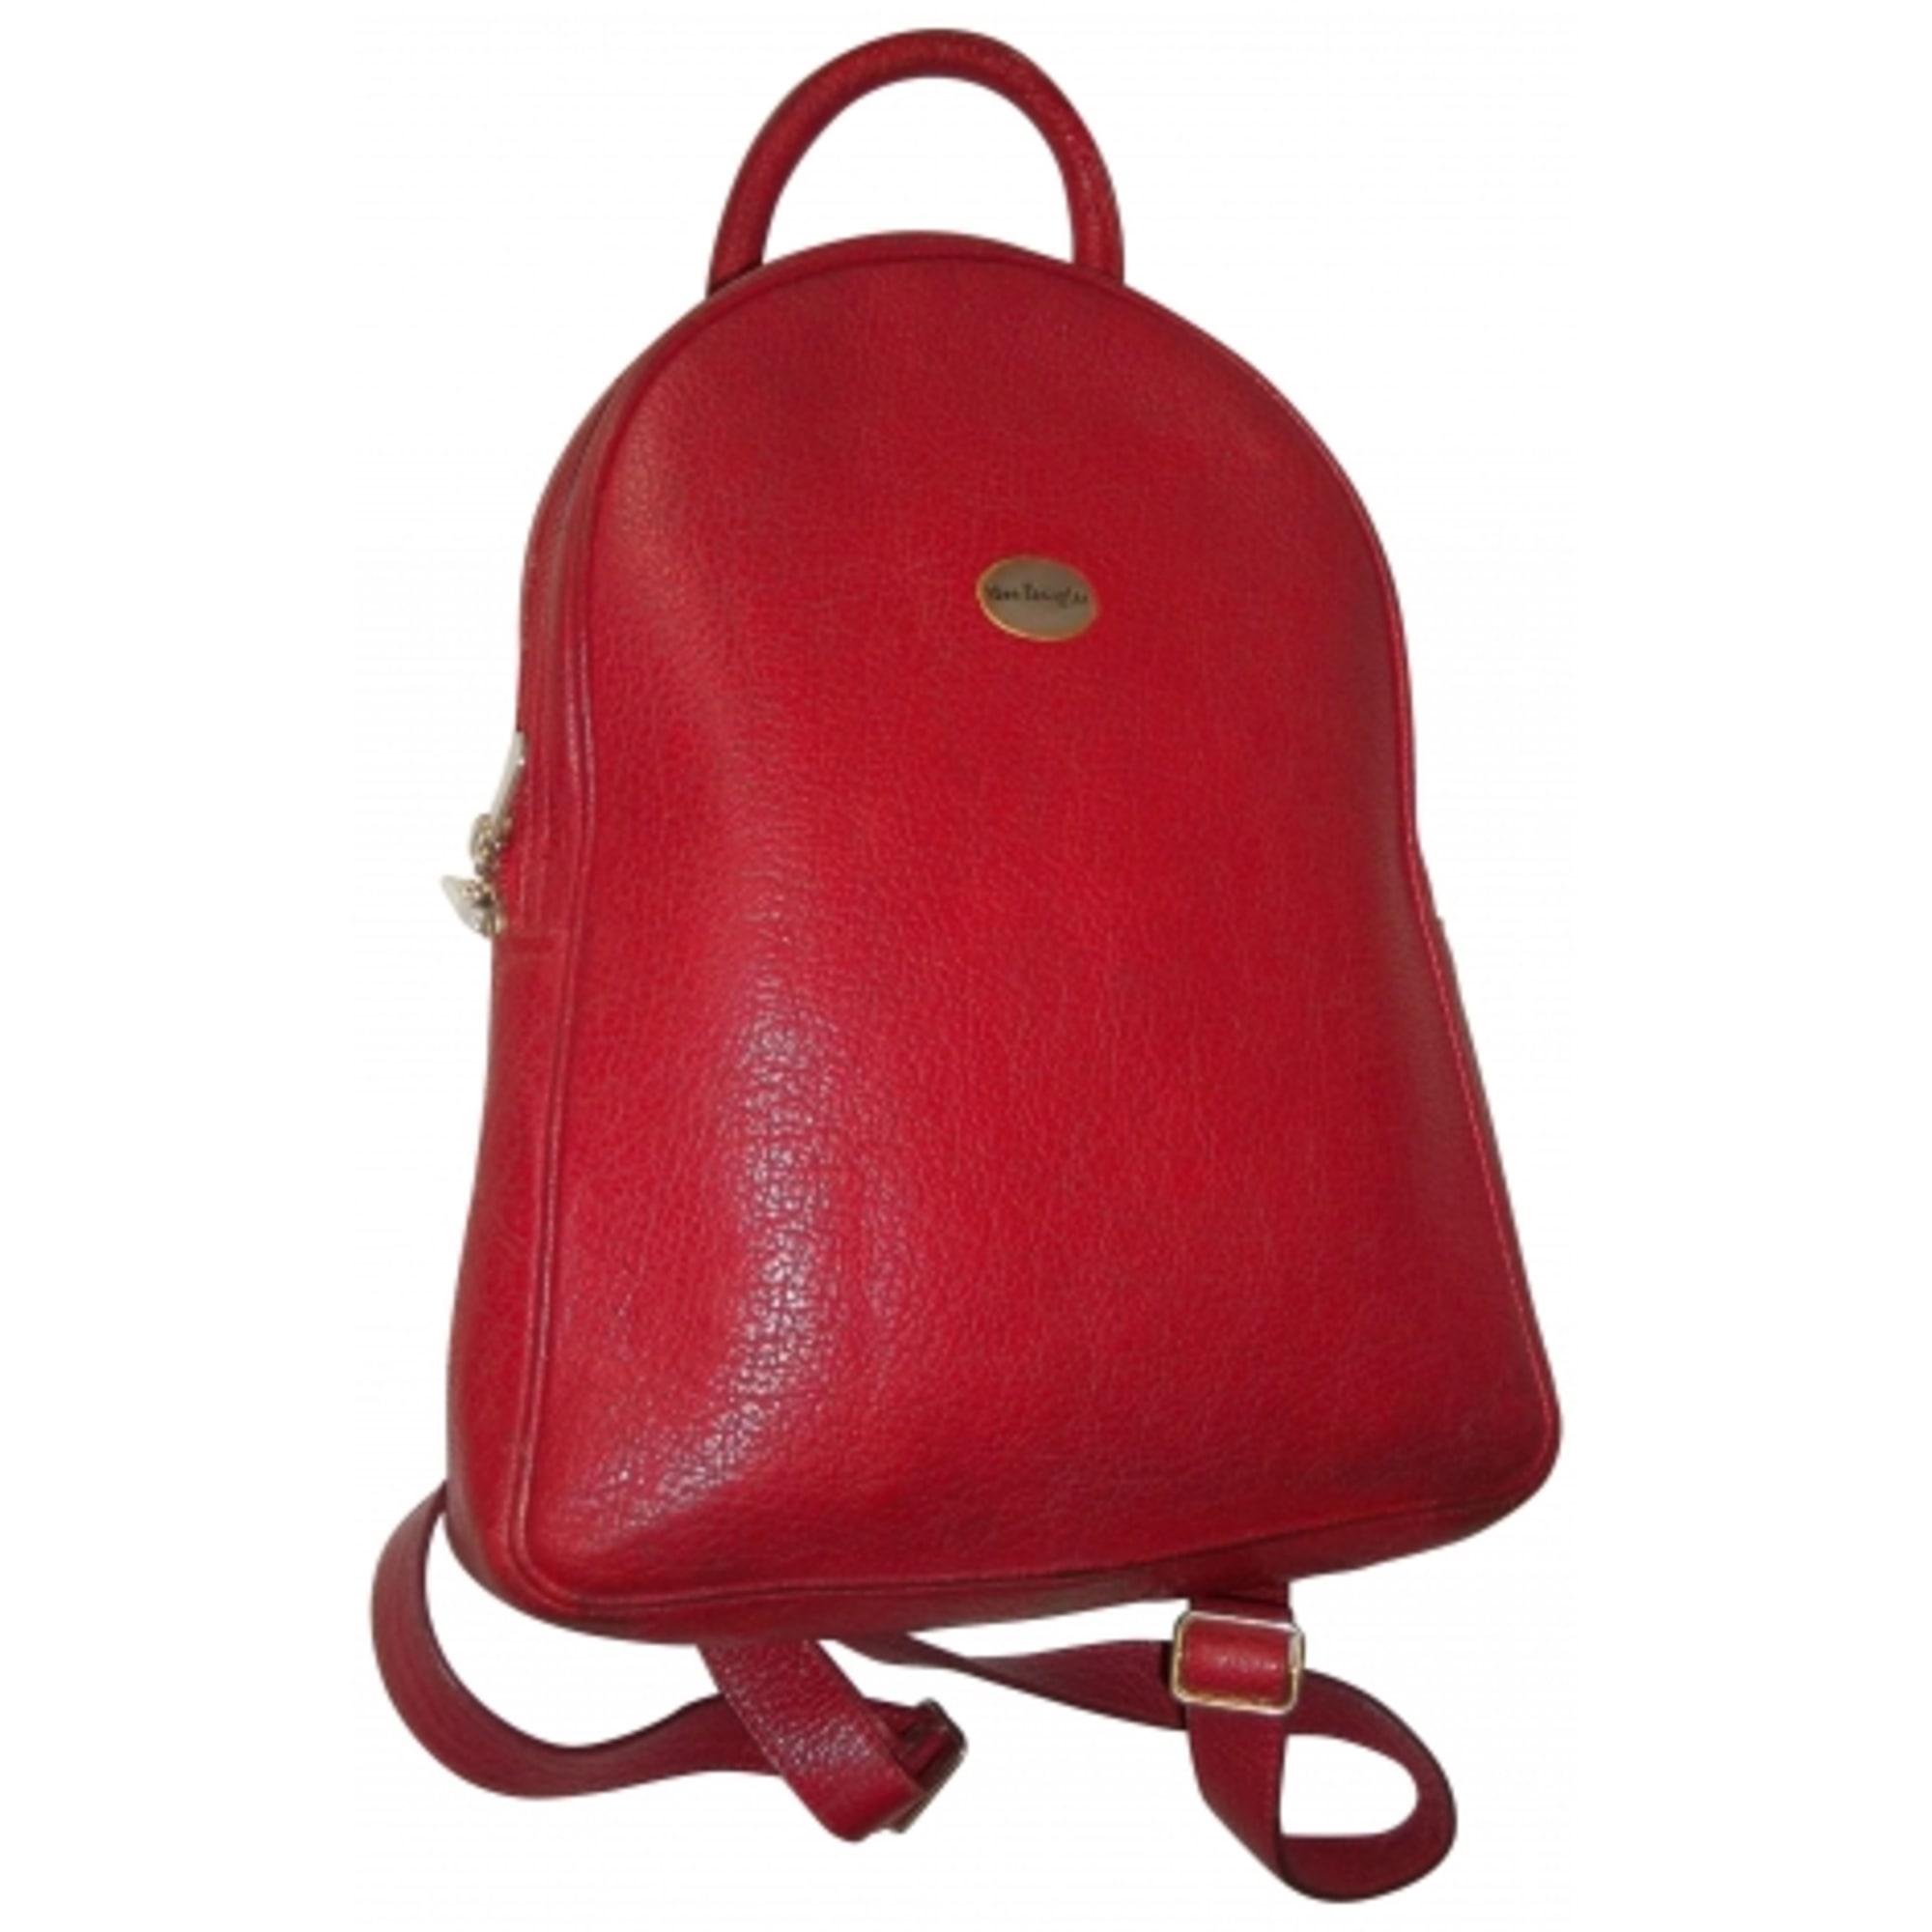 b049344f8fd Sac à dos MAC DOUGLAS rouge vendu par Gianni109129 - 3814452